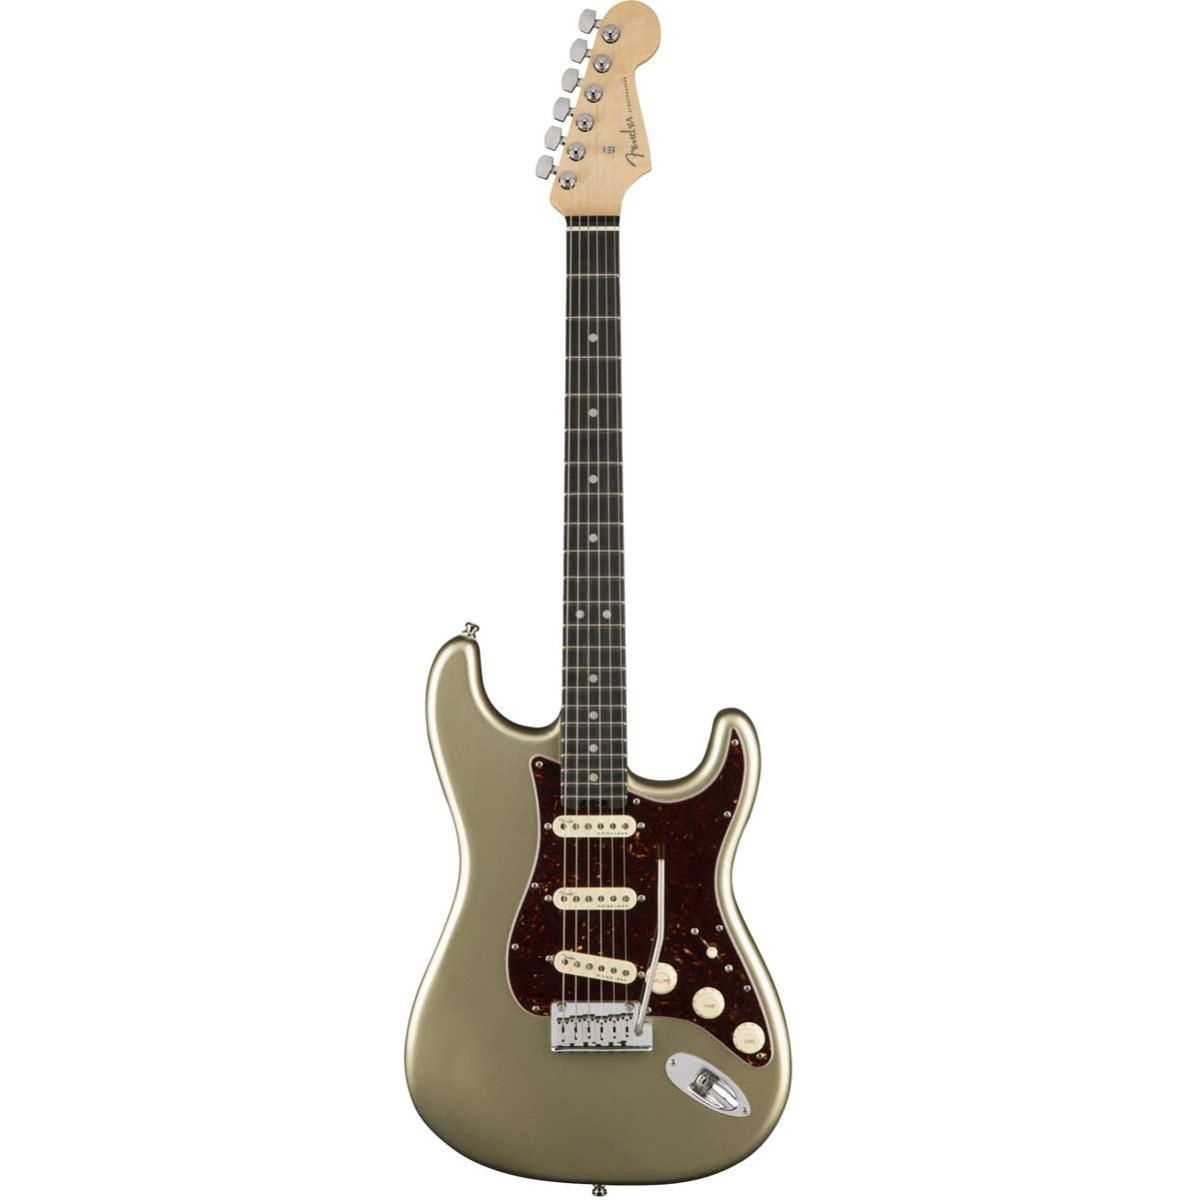 Fender American Elite Stratocaster, EB, CHMP el-guitar champagne